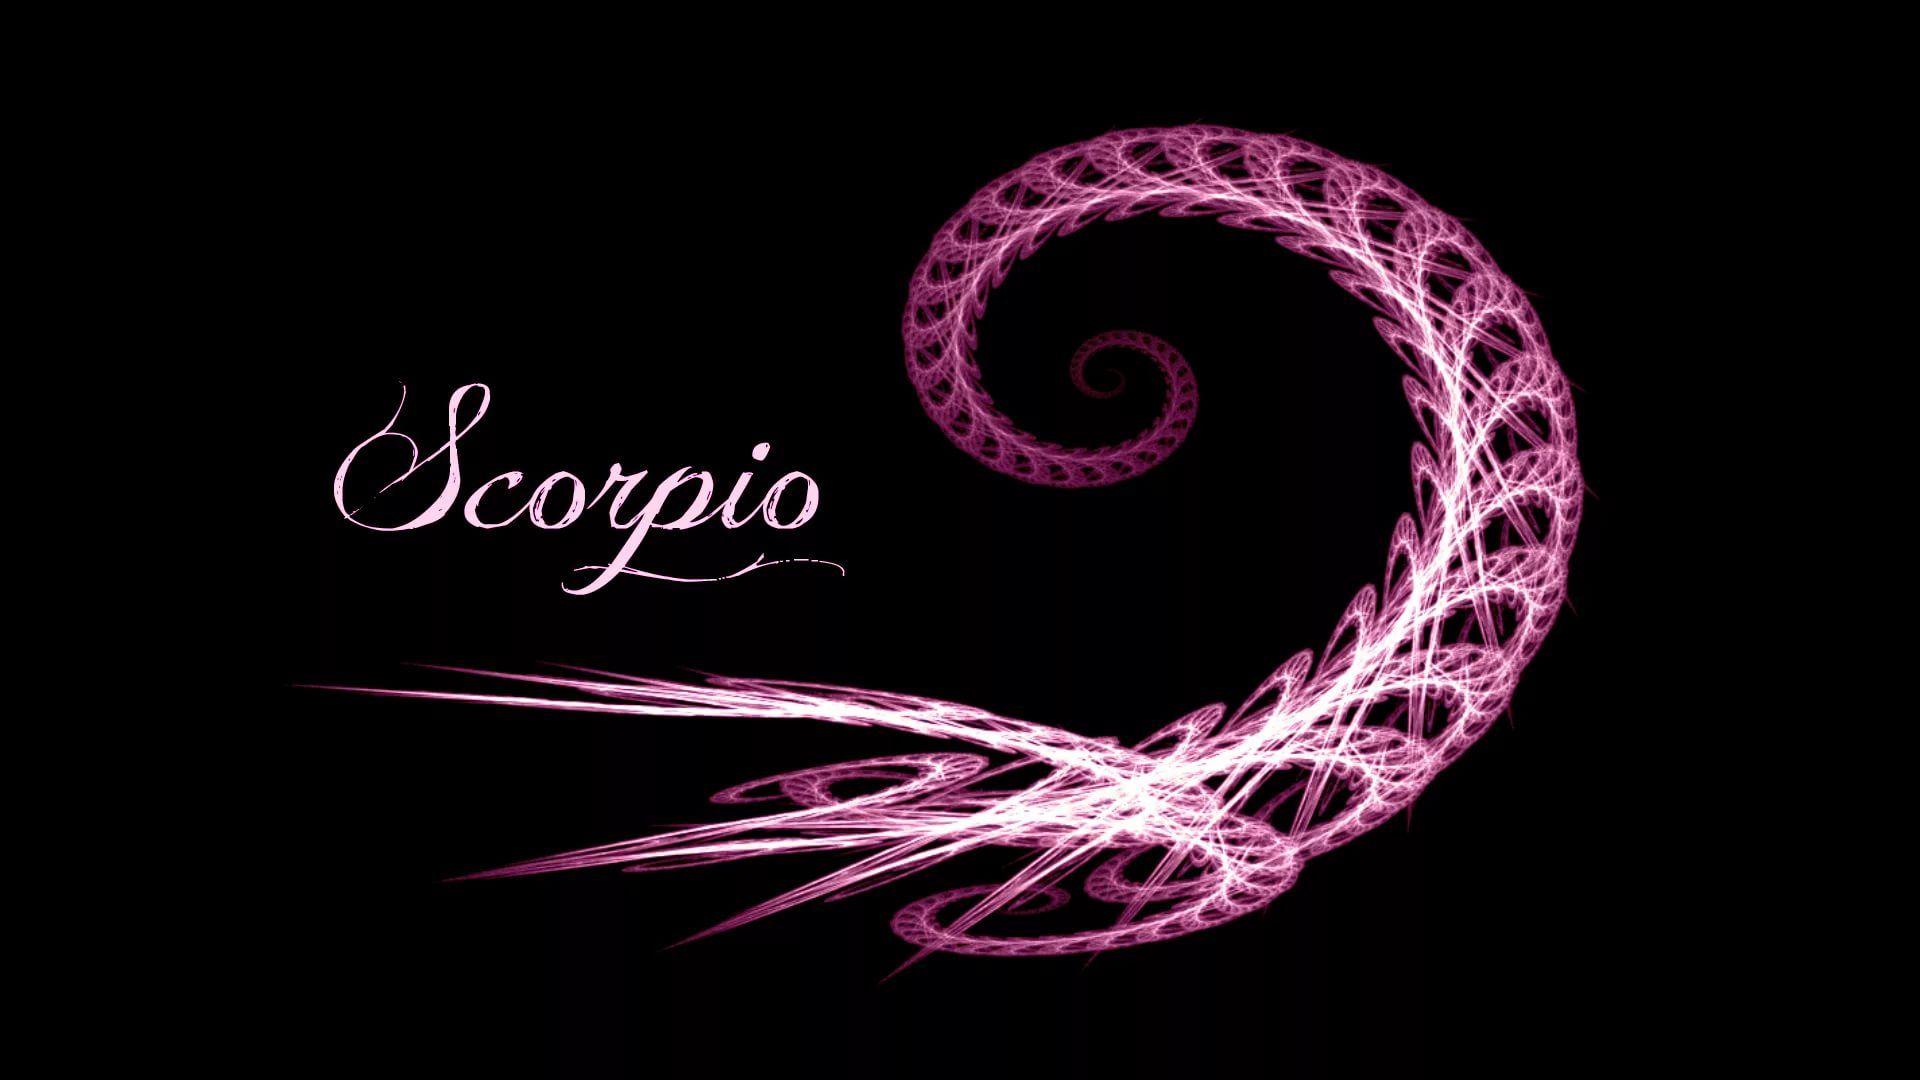 Scorpio hd wallpaper download